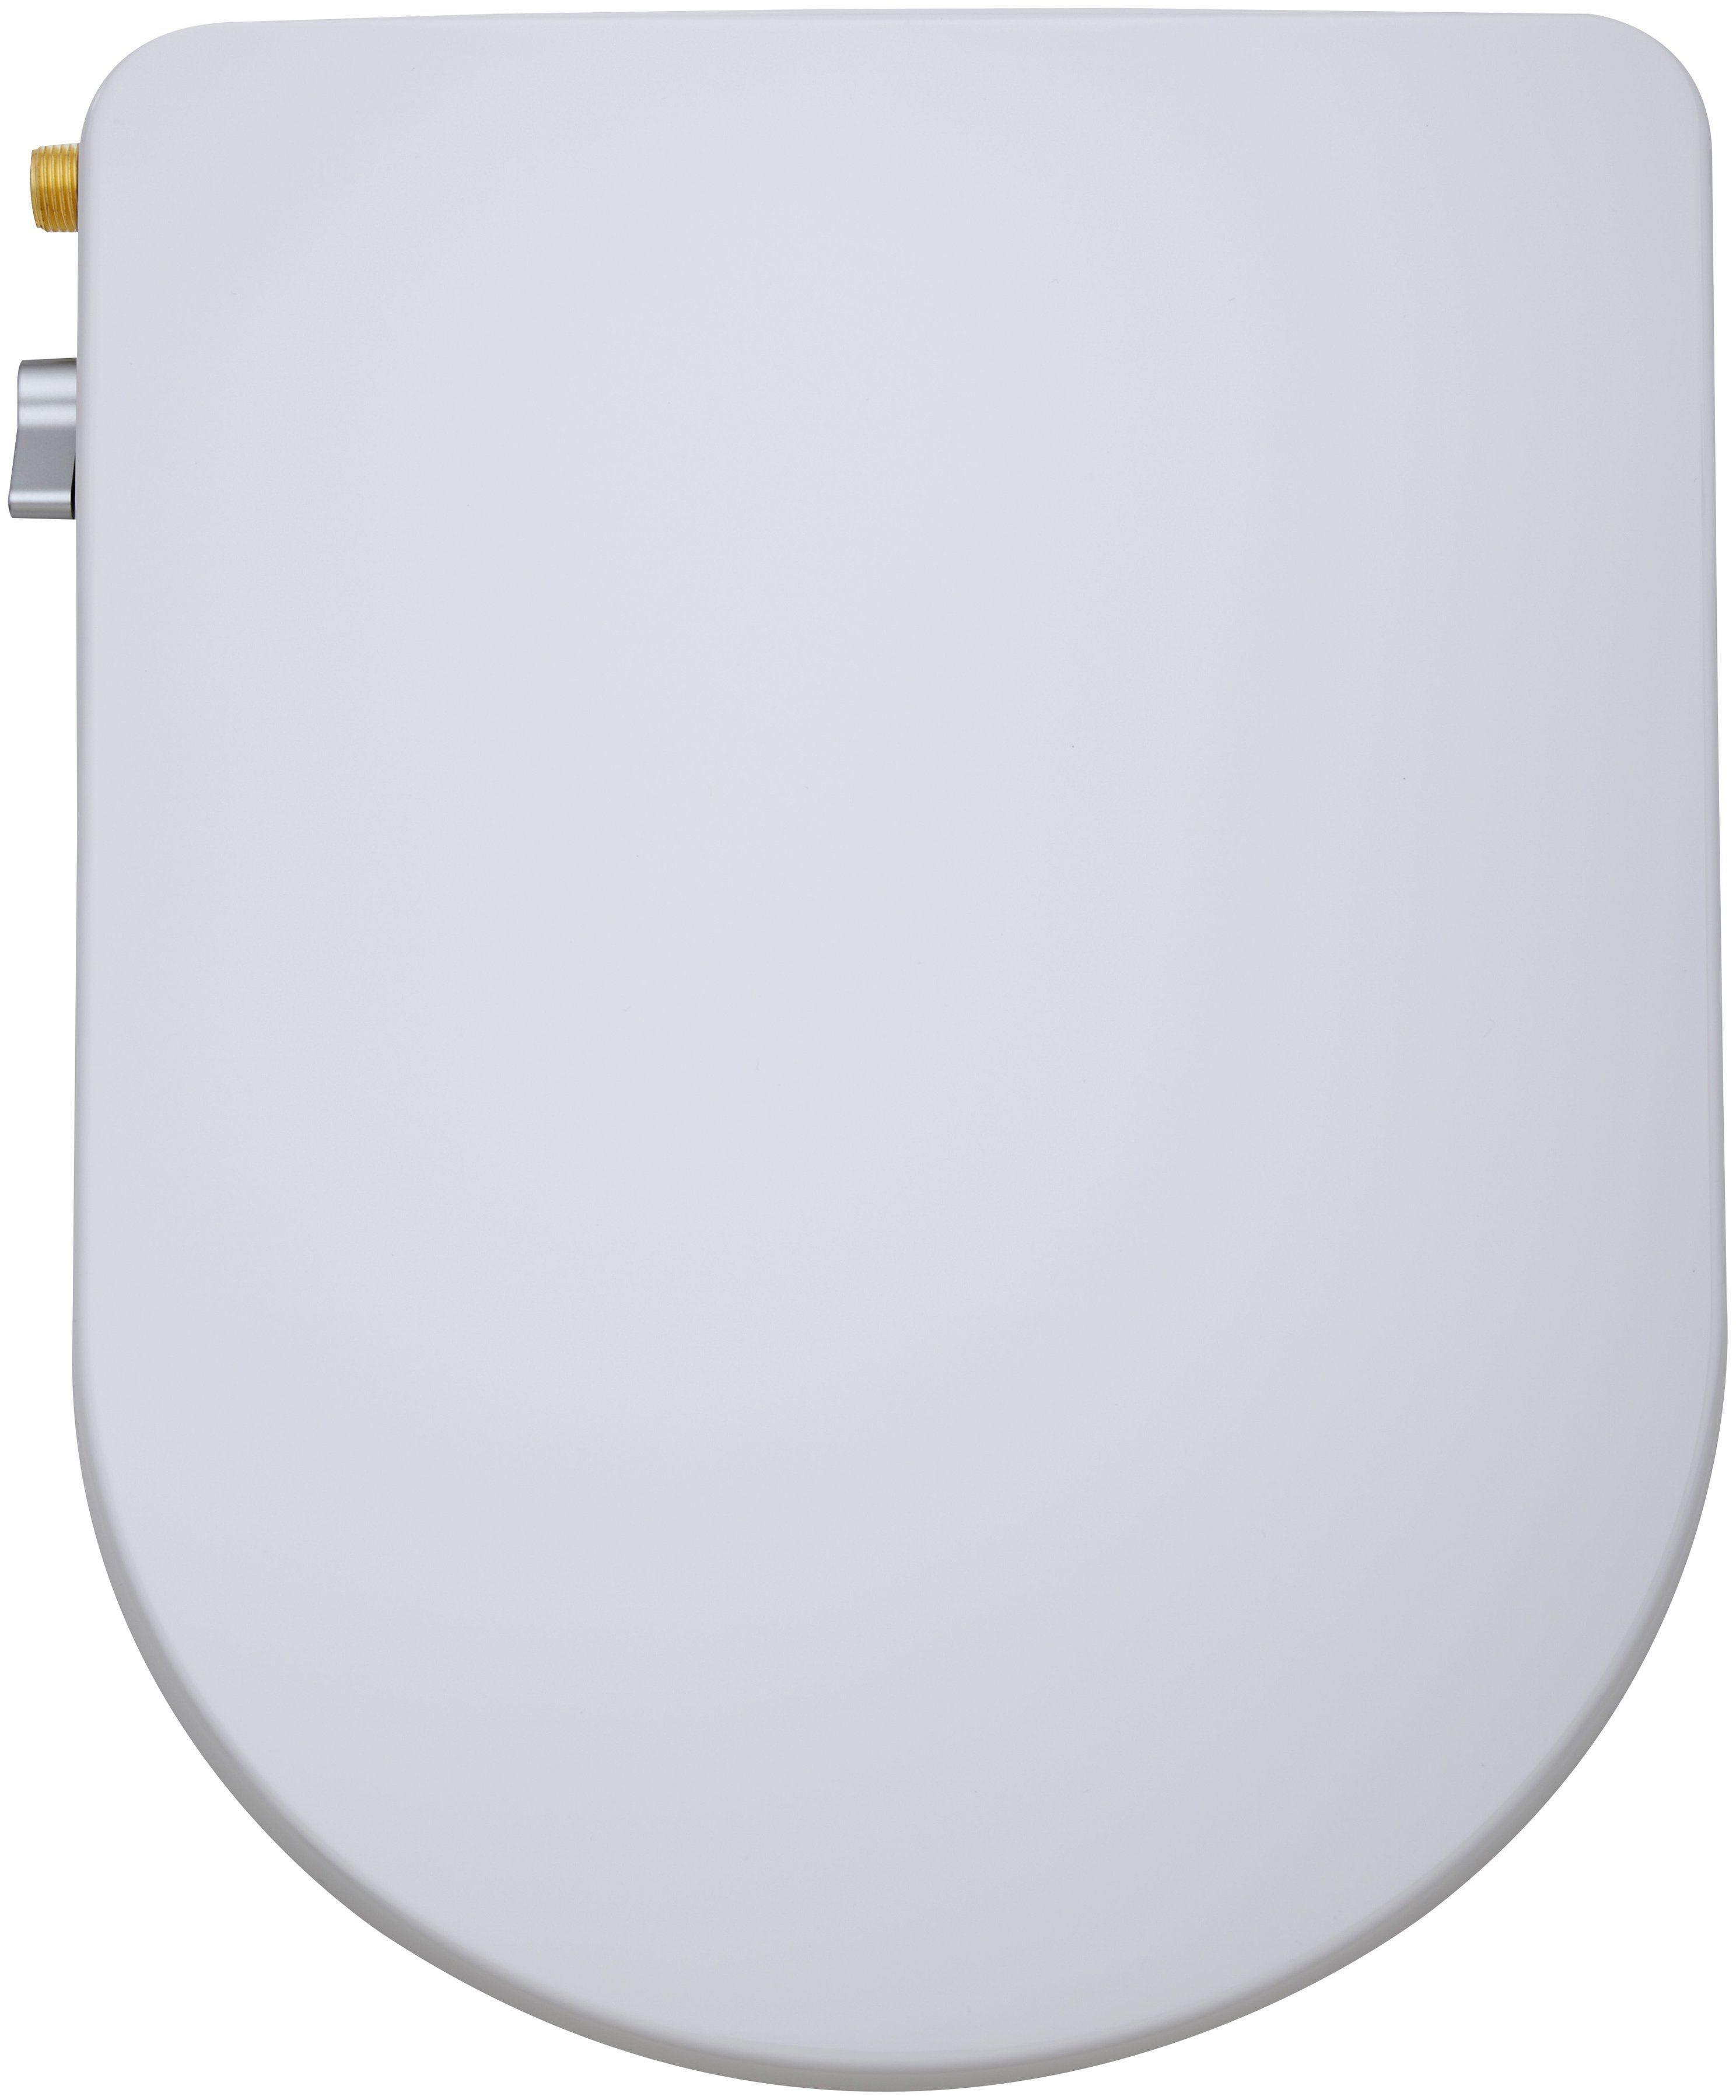 Dusch-WC-Aufsatz »FP104«